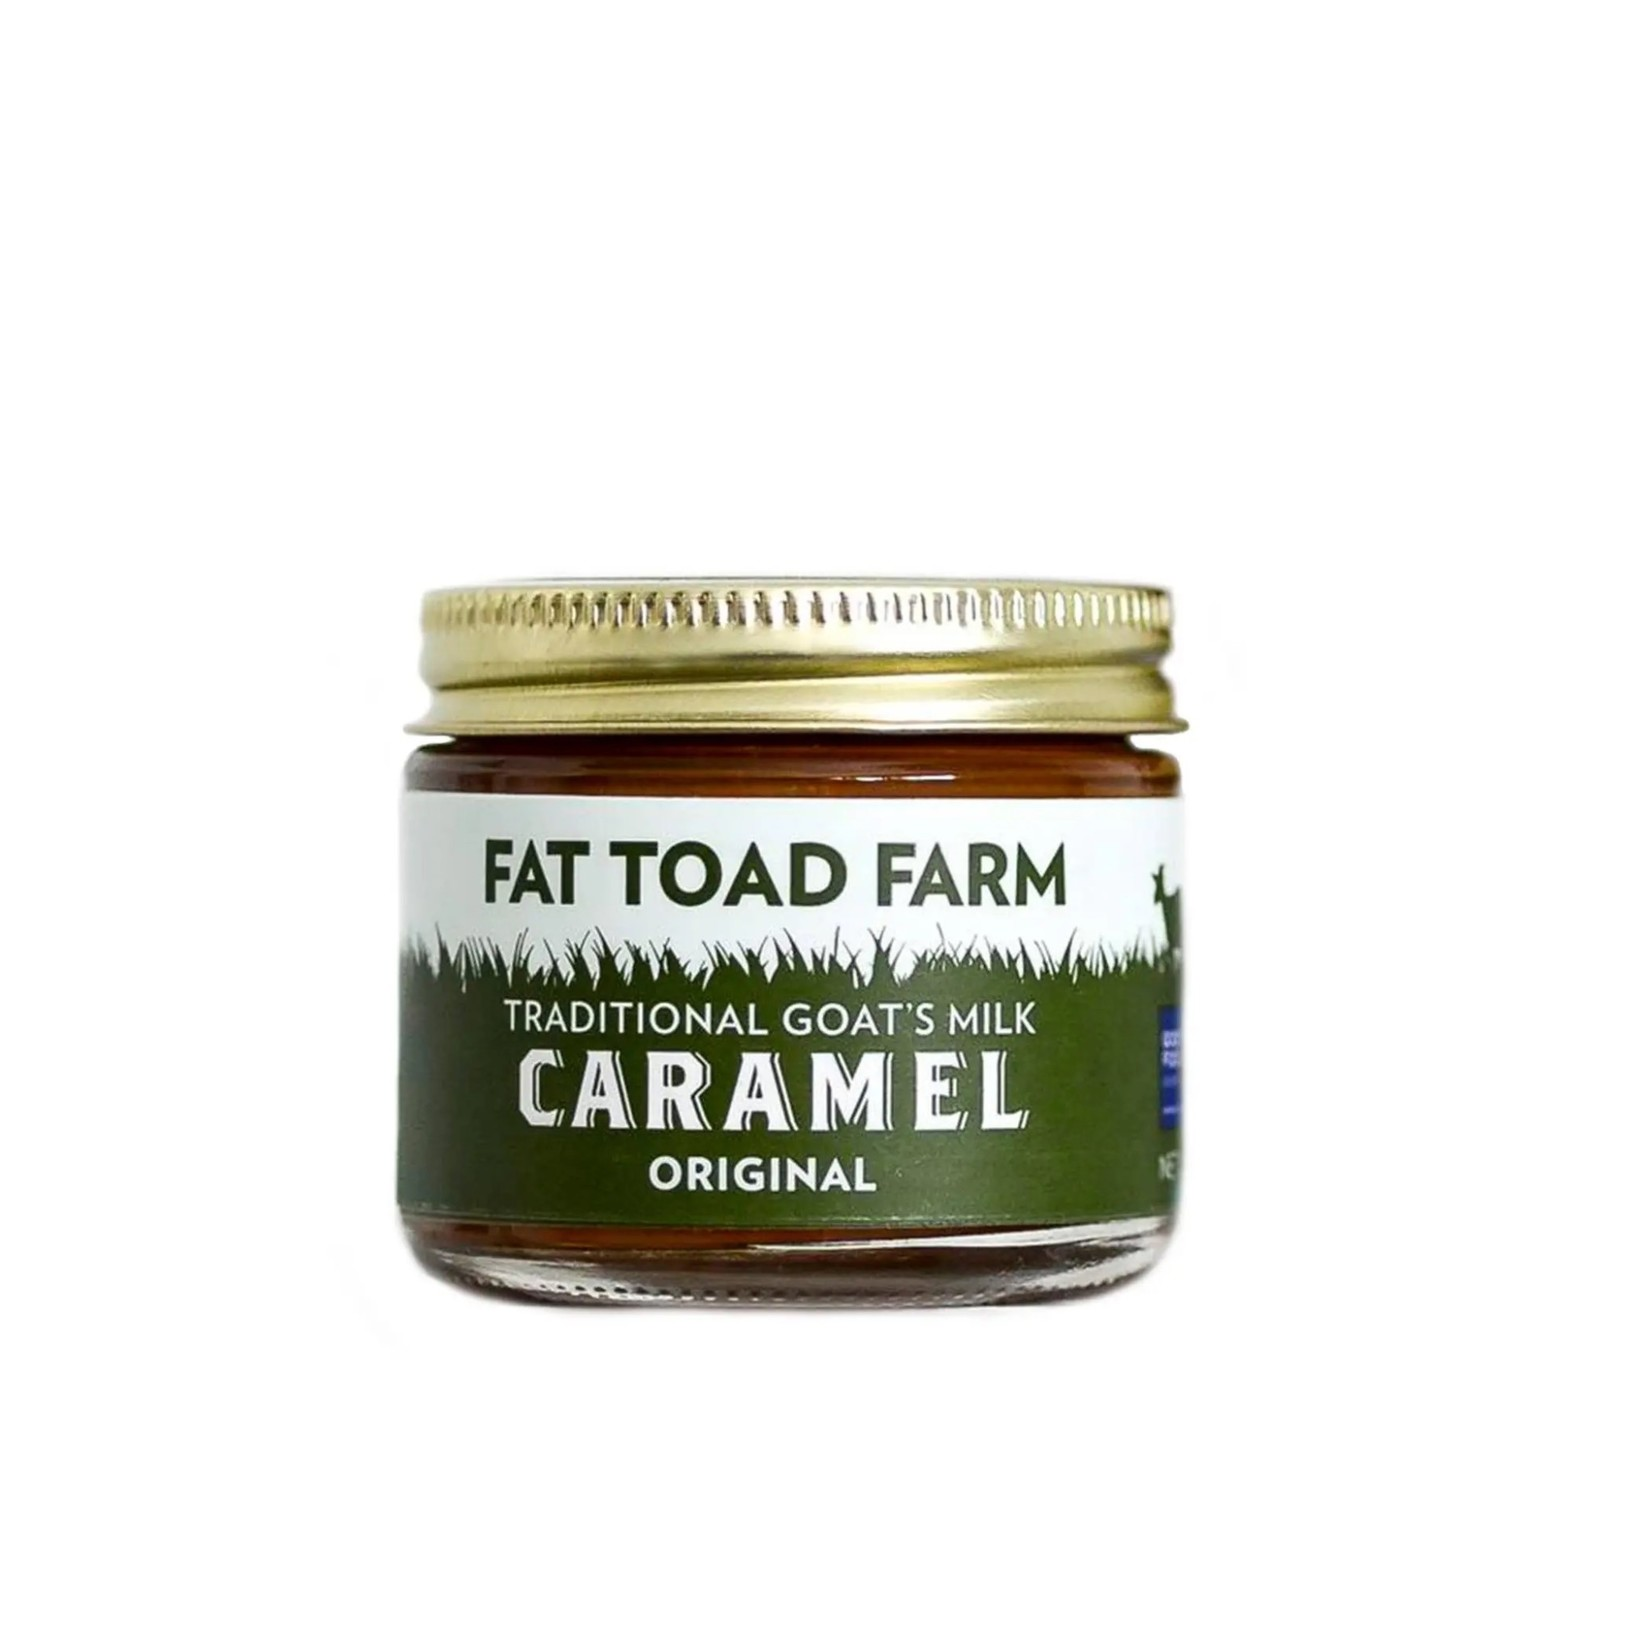 2oz Original Goat's Milk Caramel